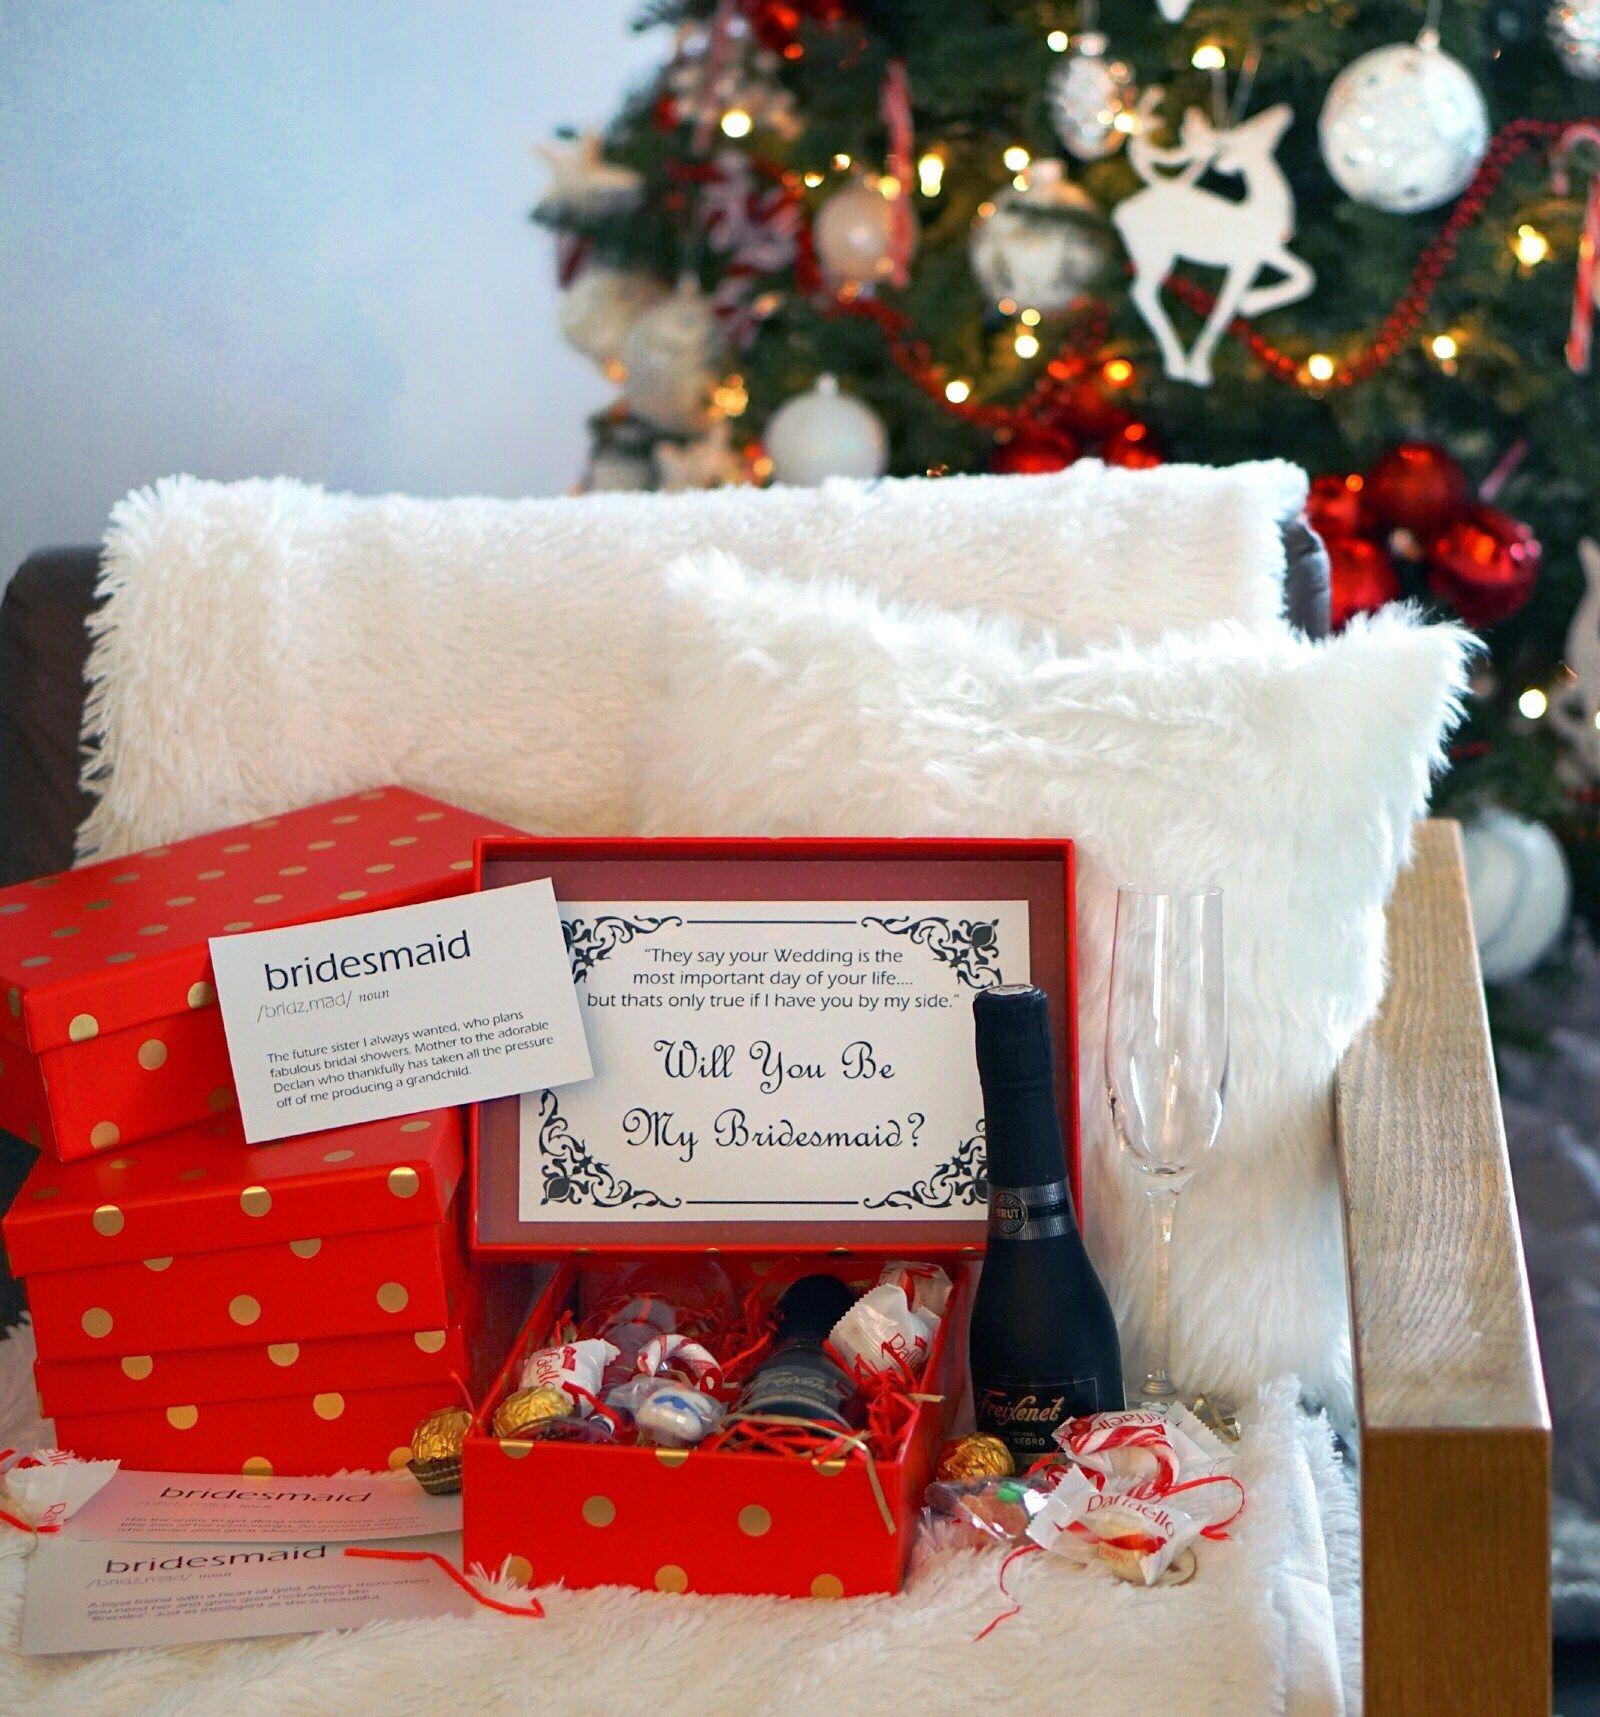 Diy bridesmaid proposal box with definition card ideas